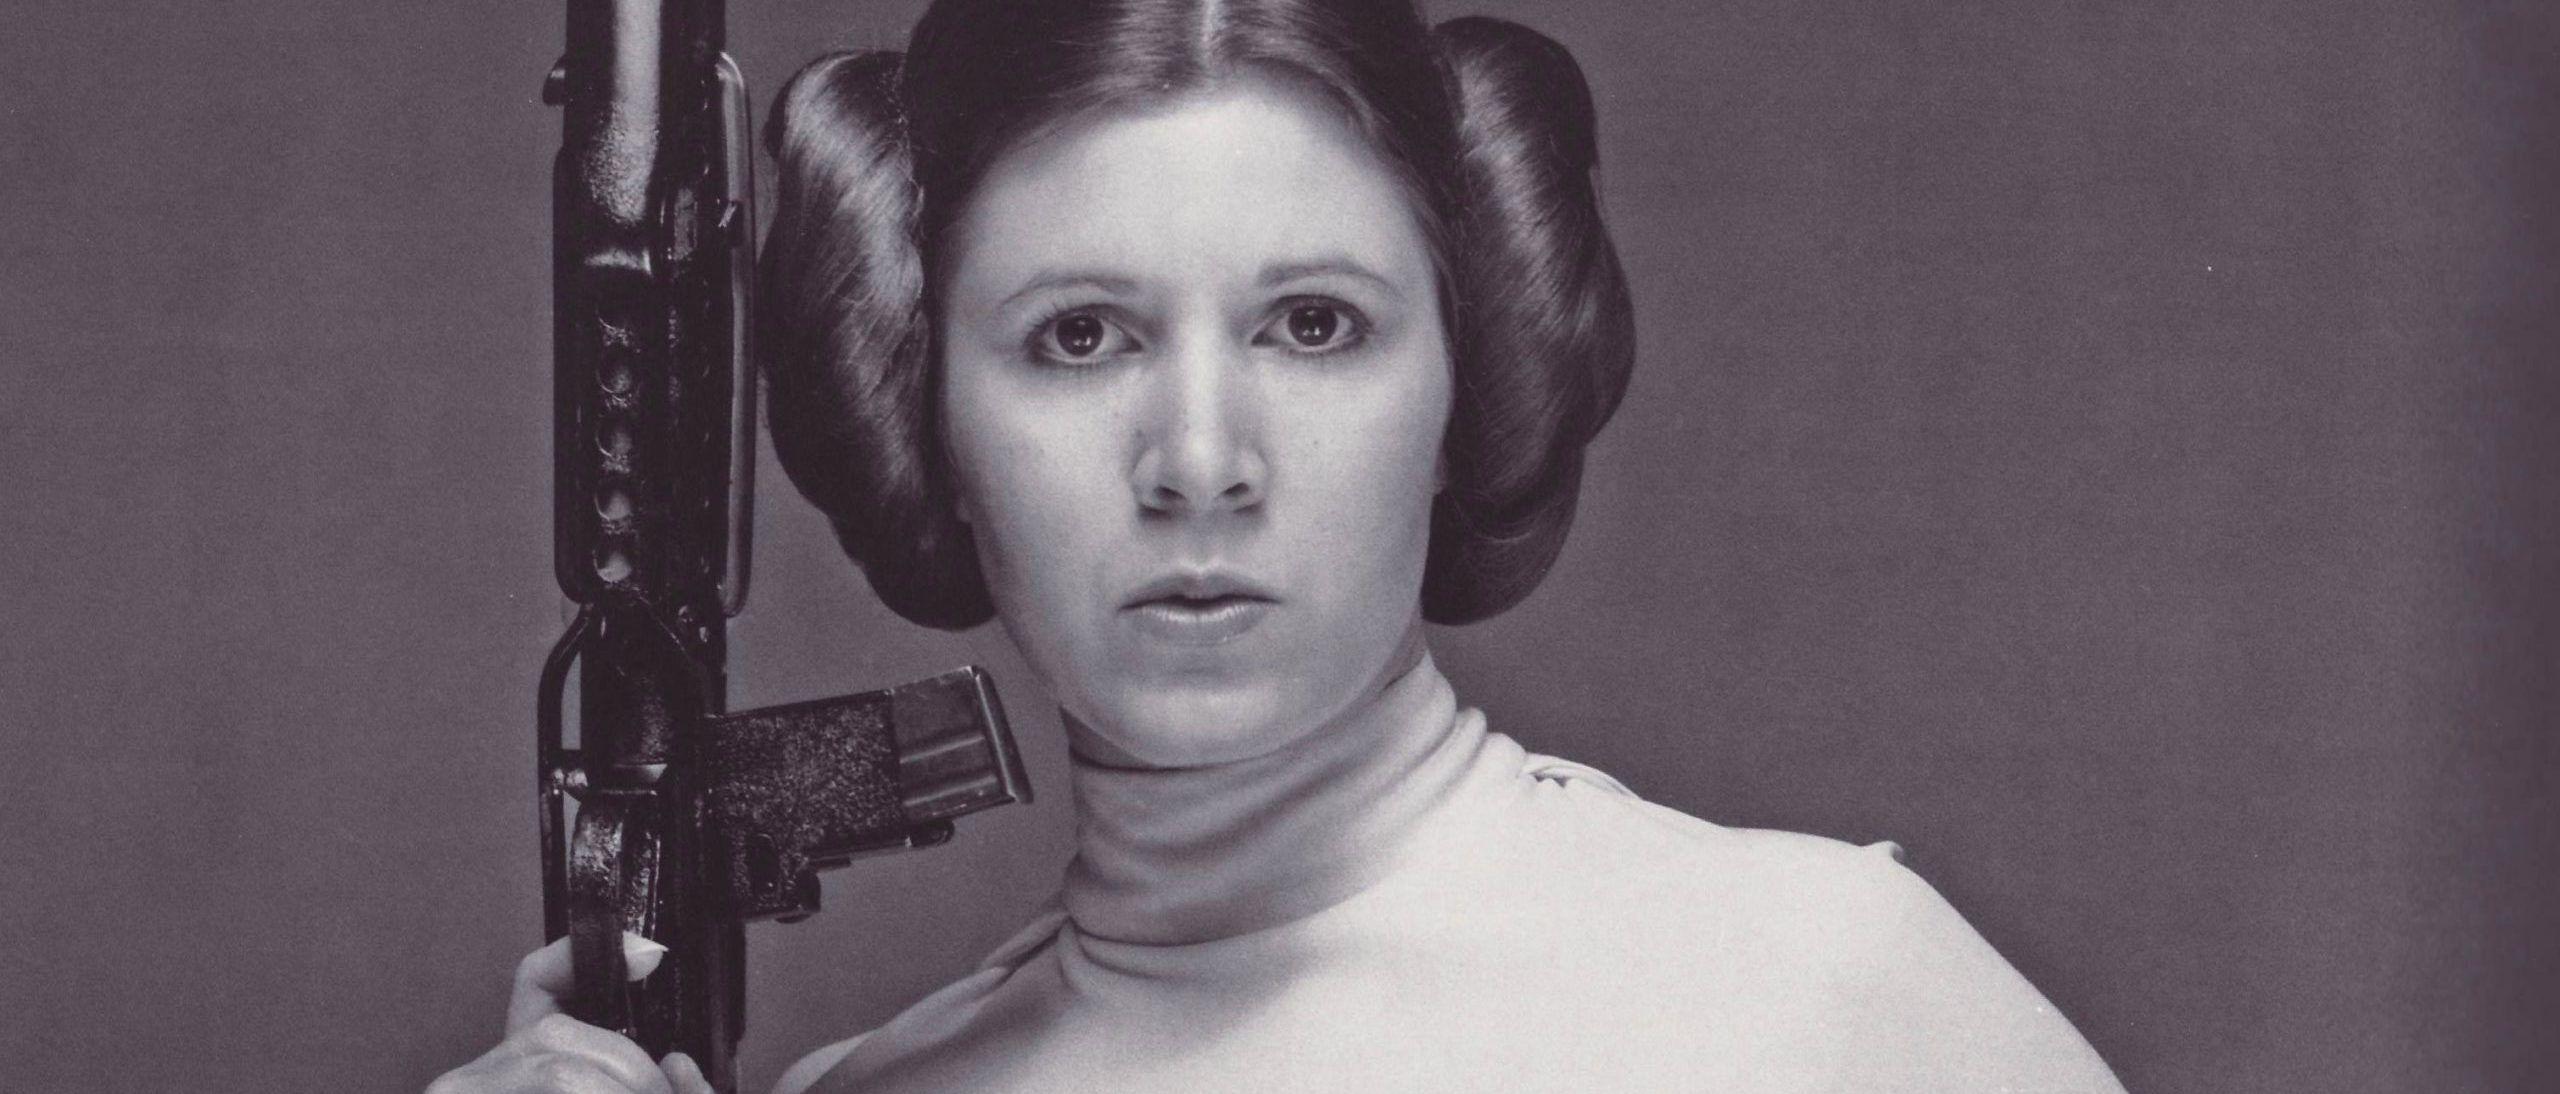 Star Wars George Lucas Princess Leia